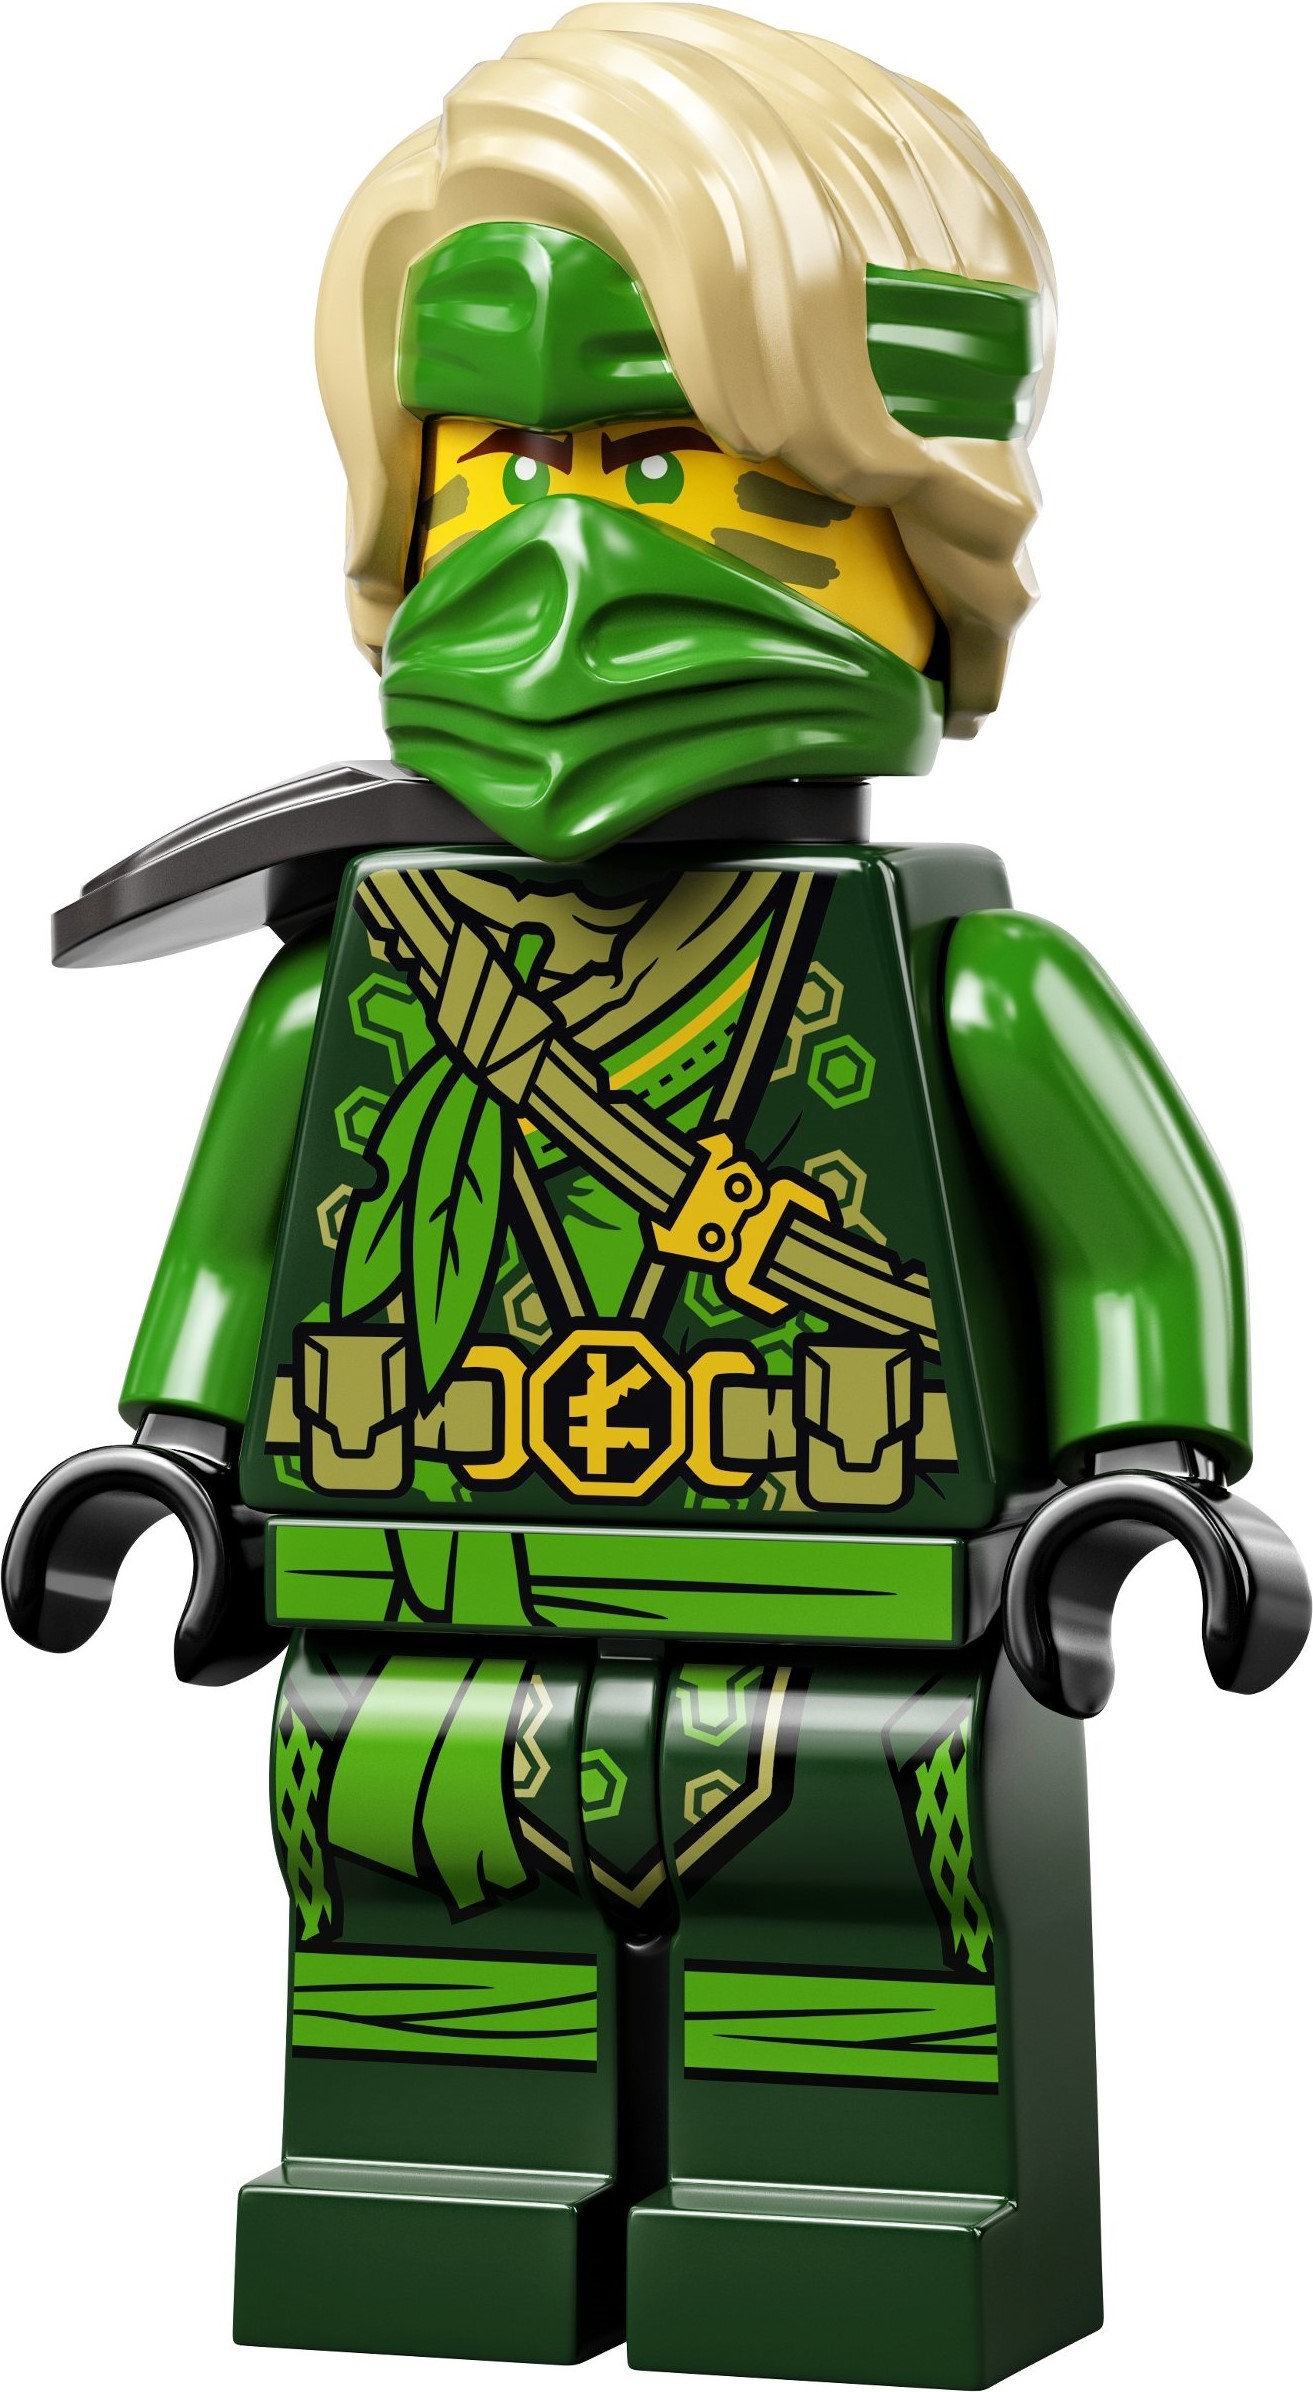 NEW LEGO Spinjitzu Slam Lot Jay Kai Zane Lloyd Minifigure Ninjago Mini Figure